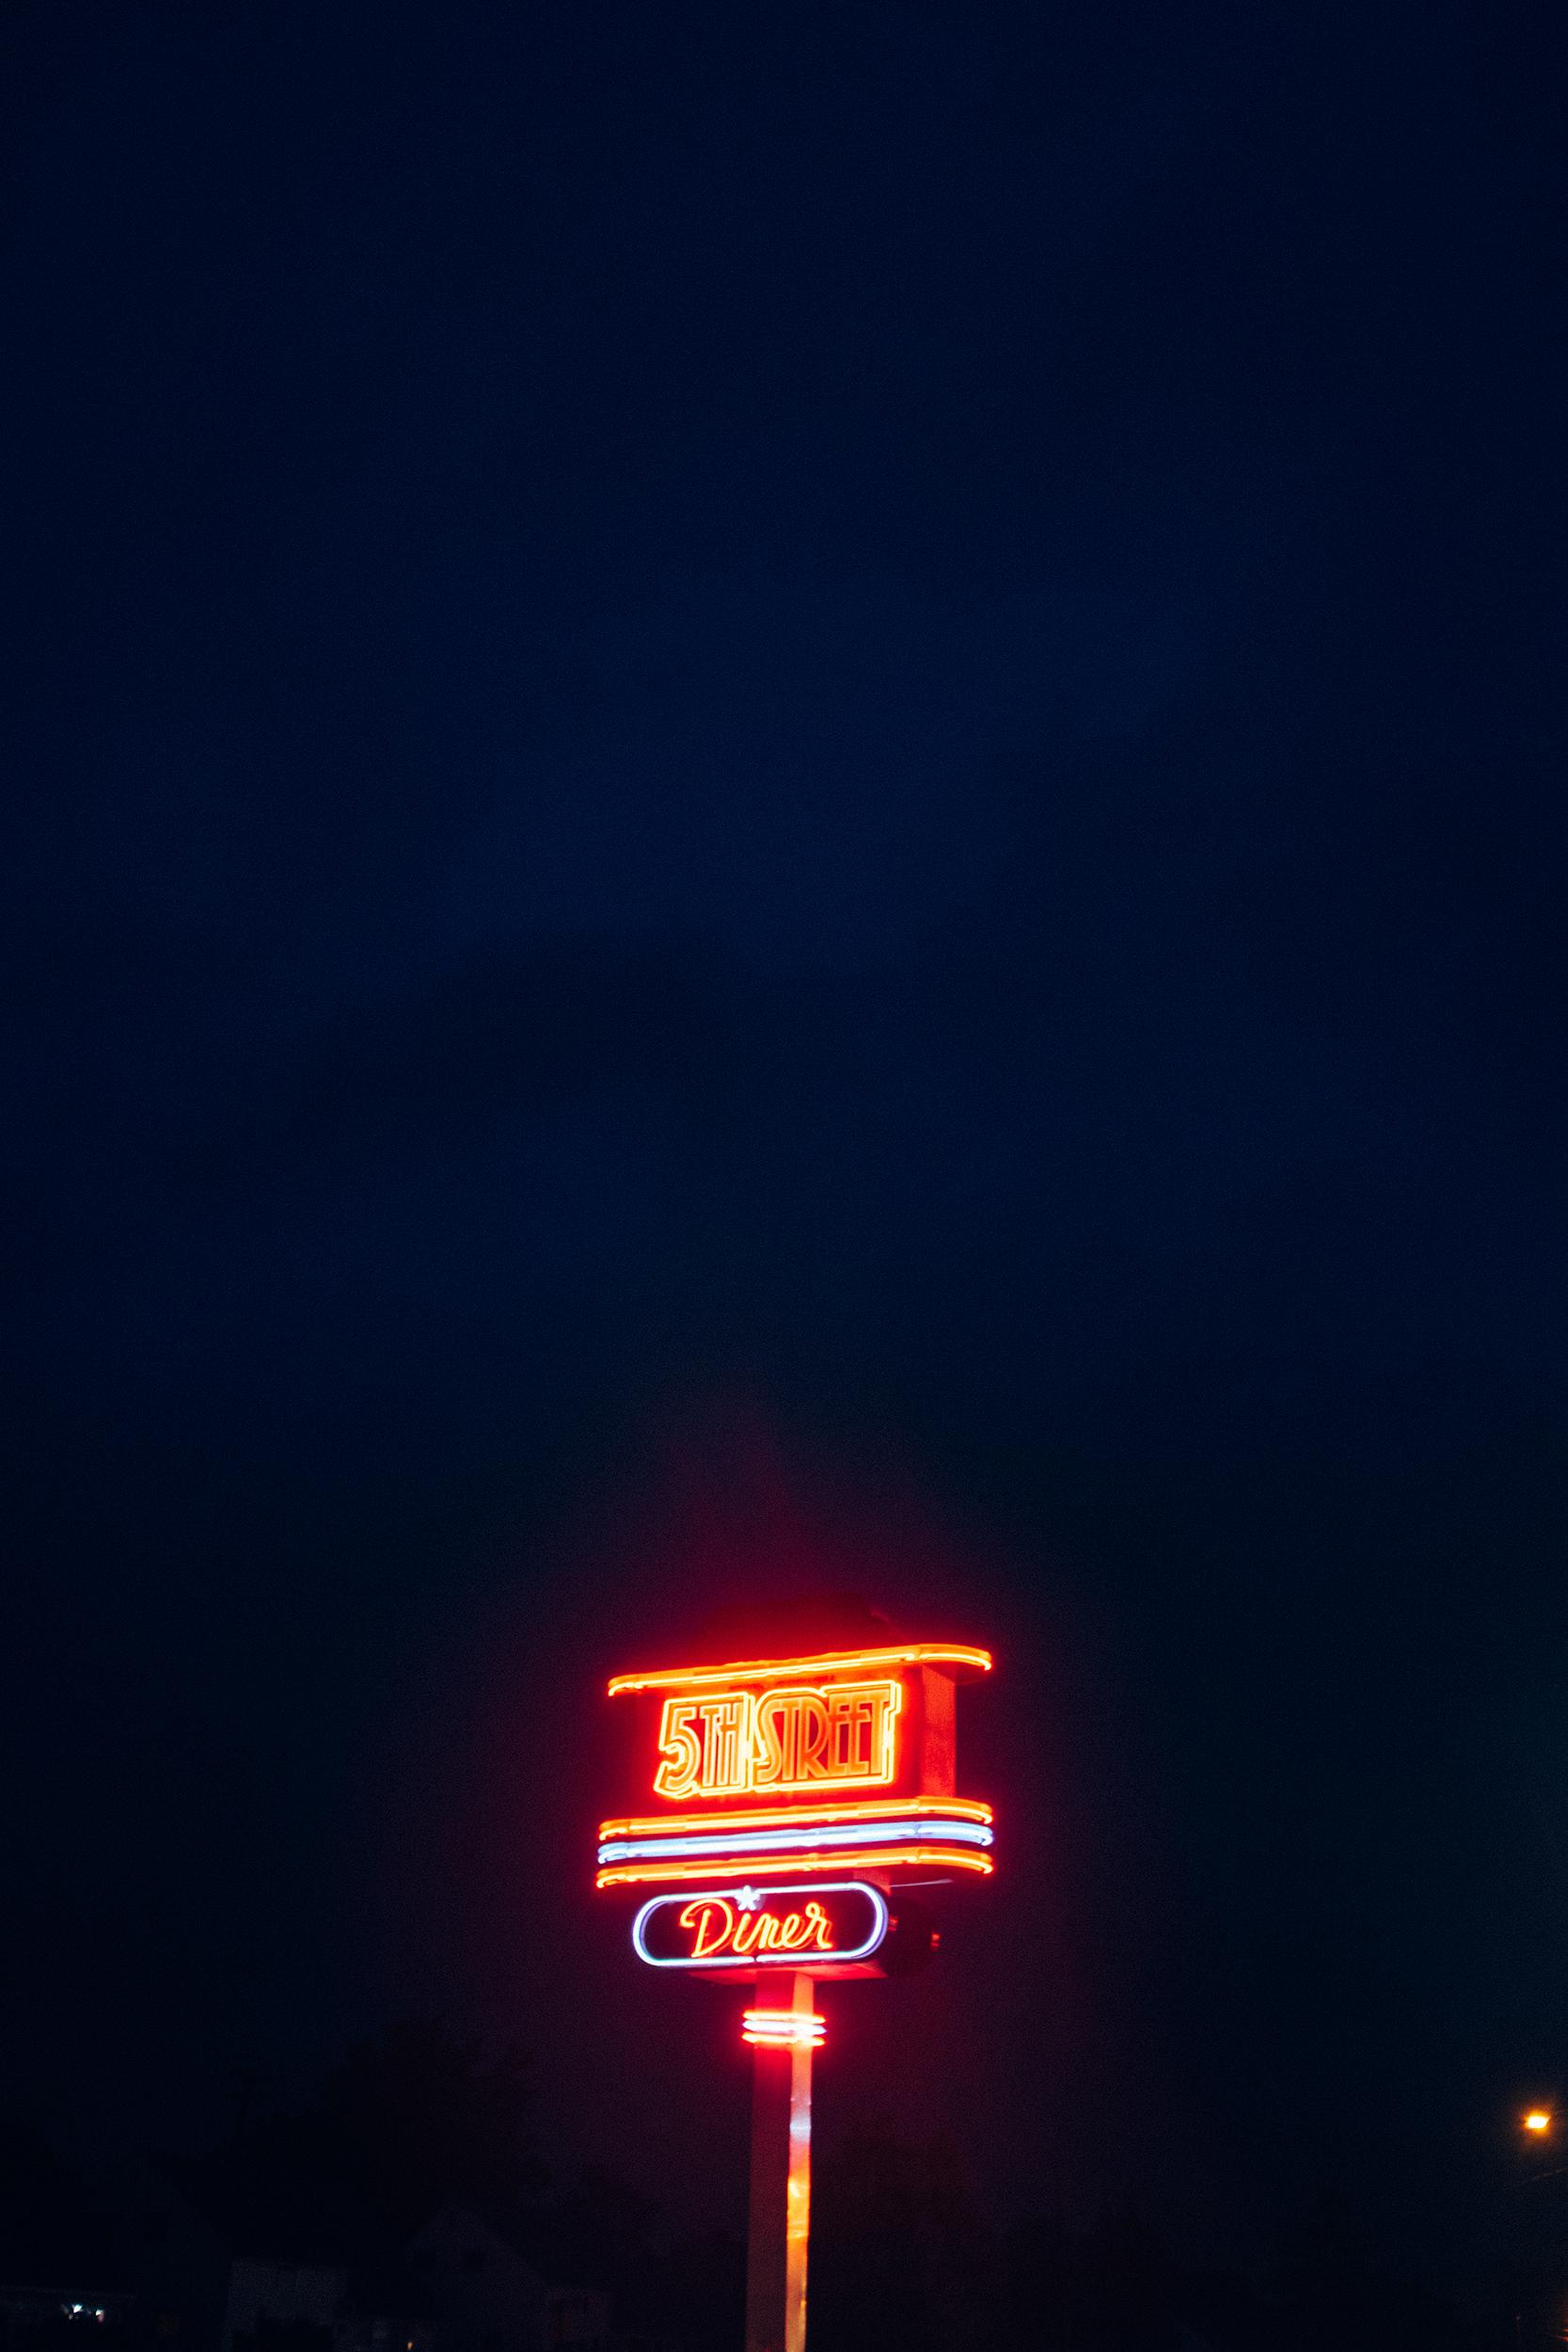 5th Street Diner , Pennsylvania, USA